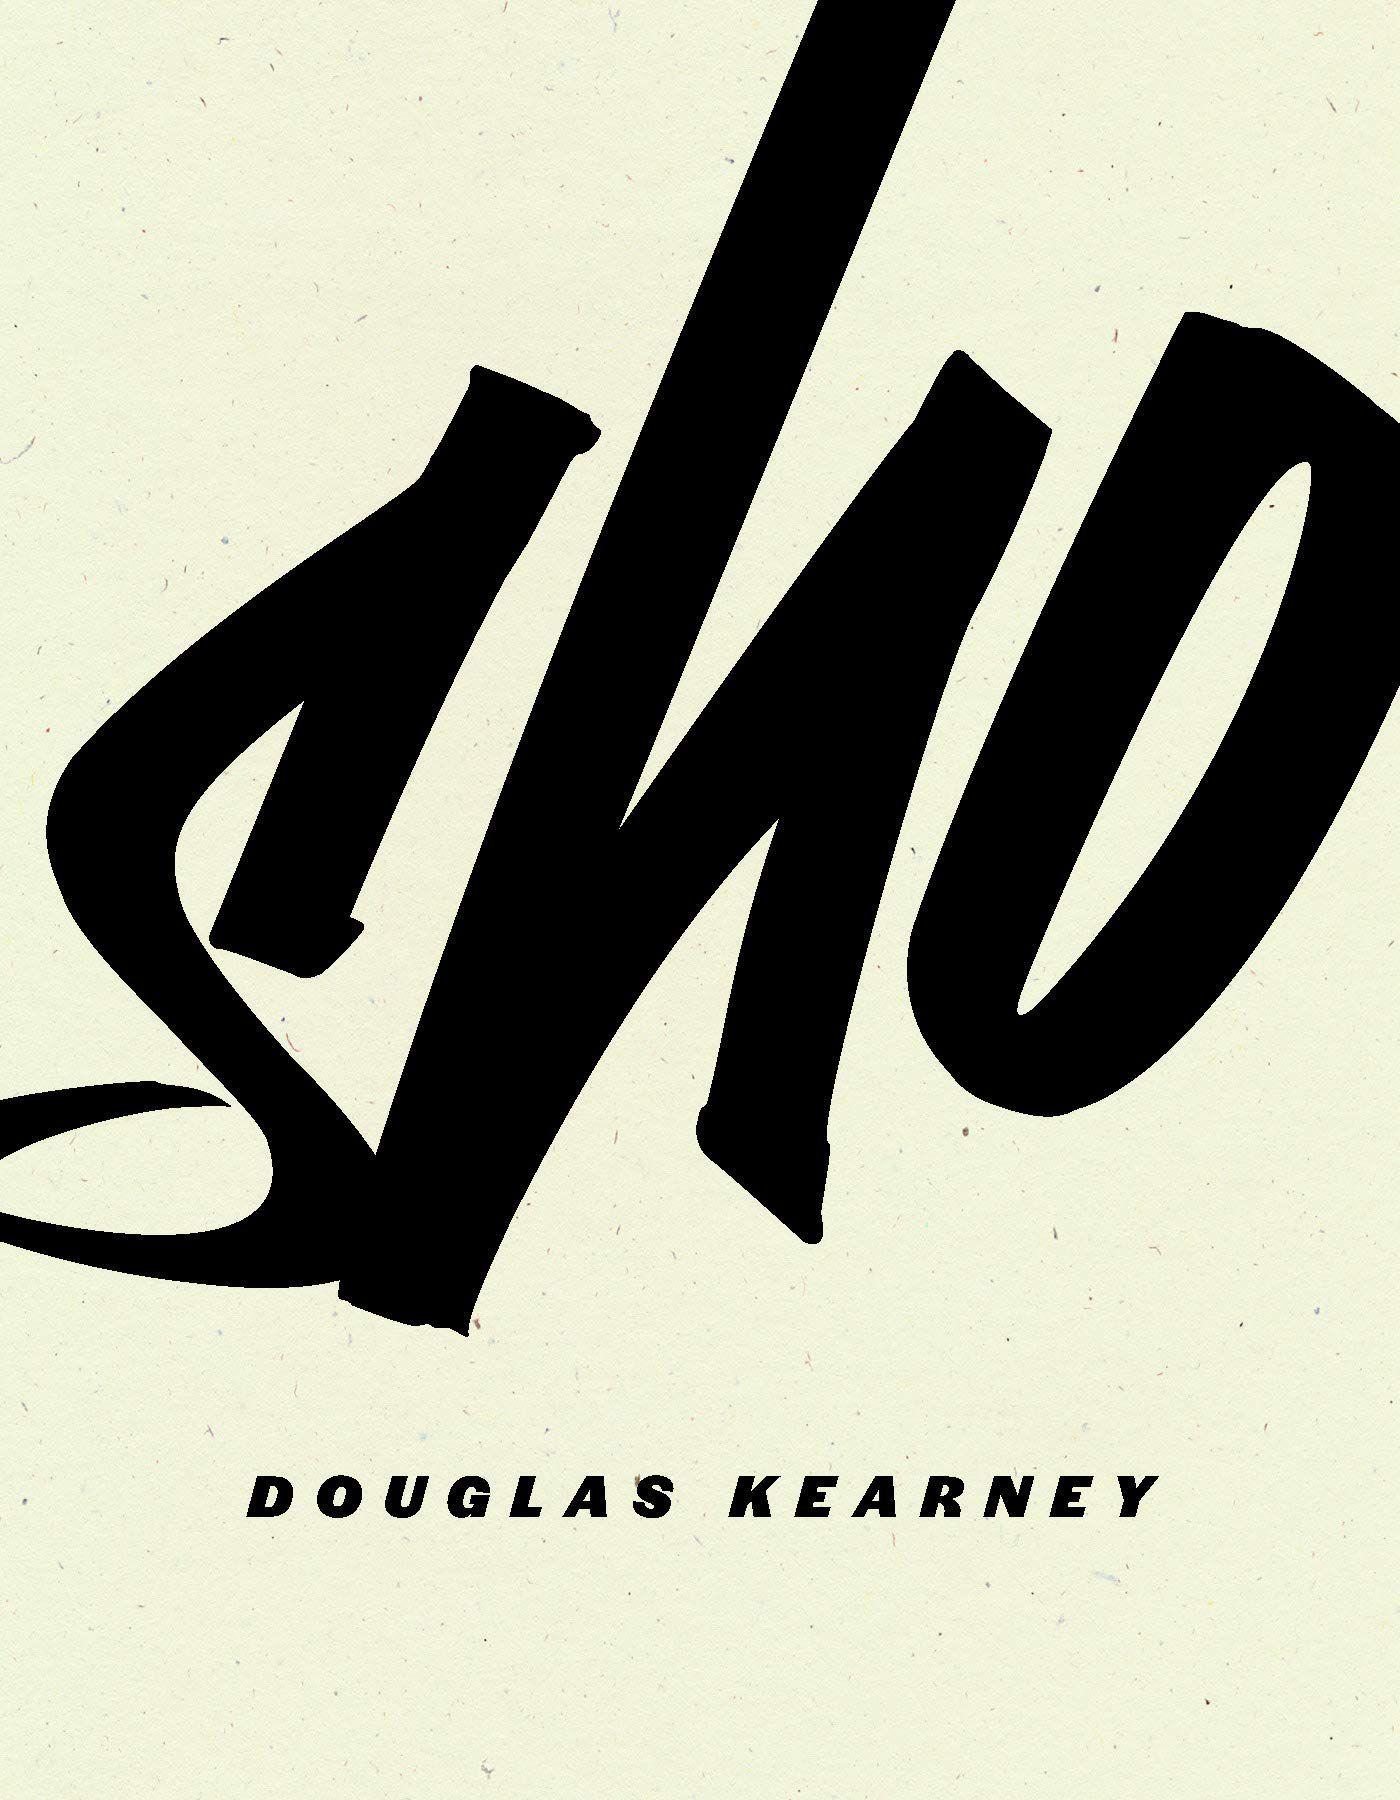 sho by douglas kearney book cover